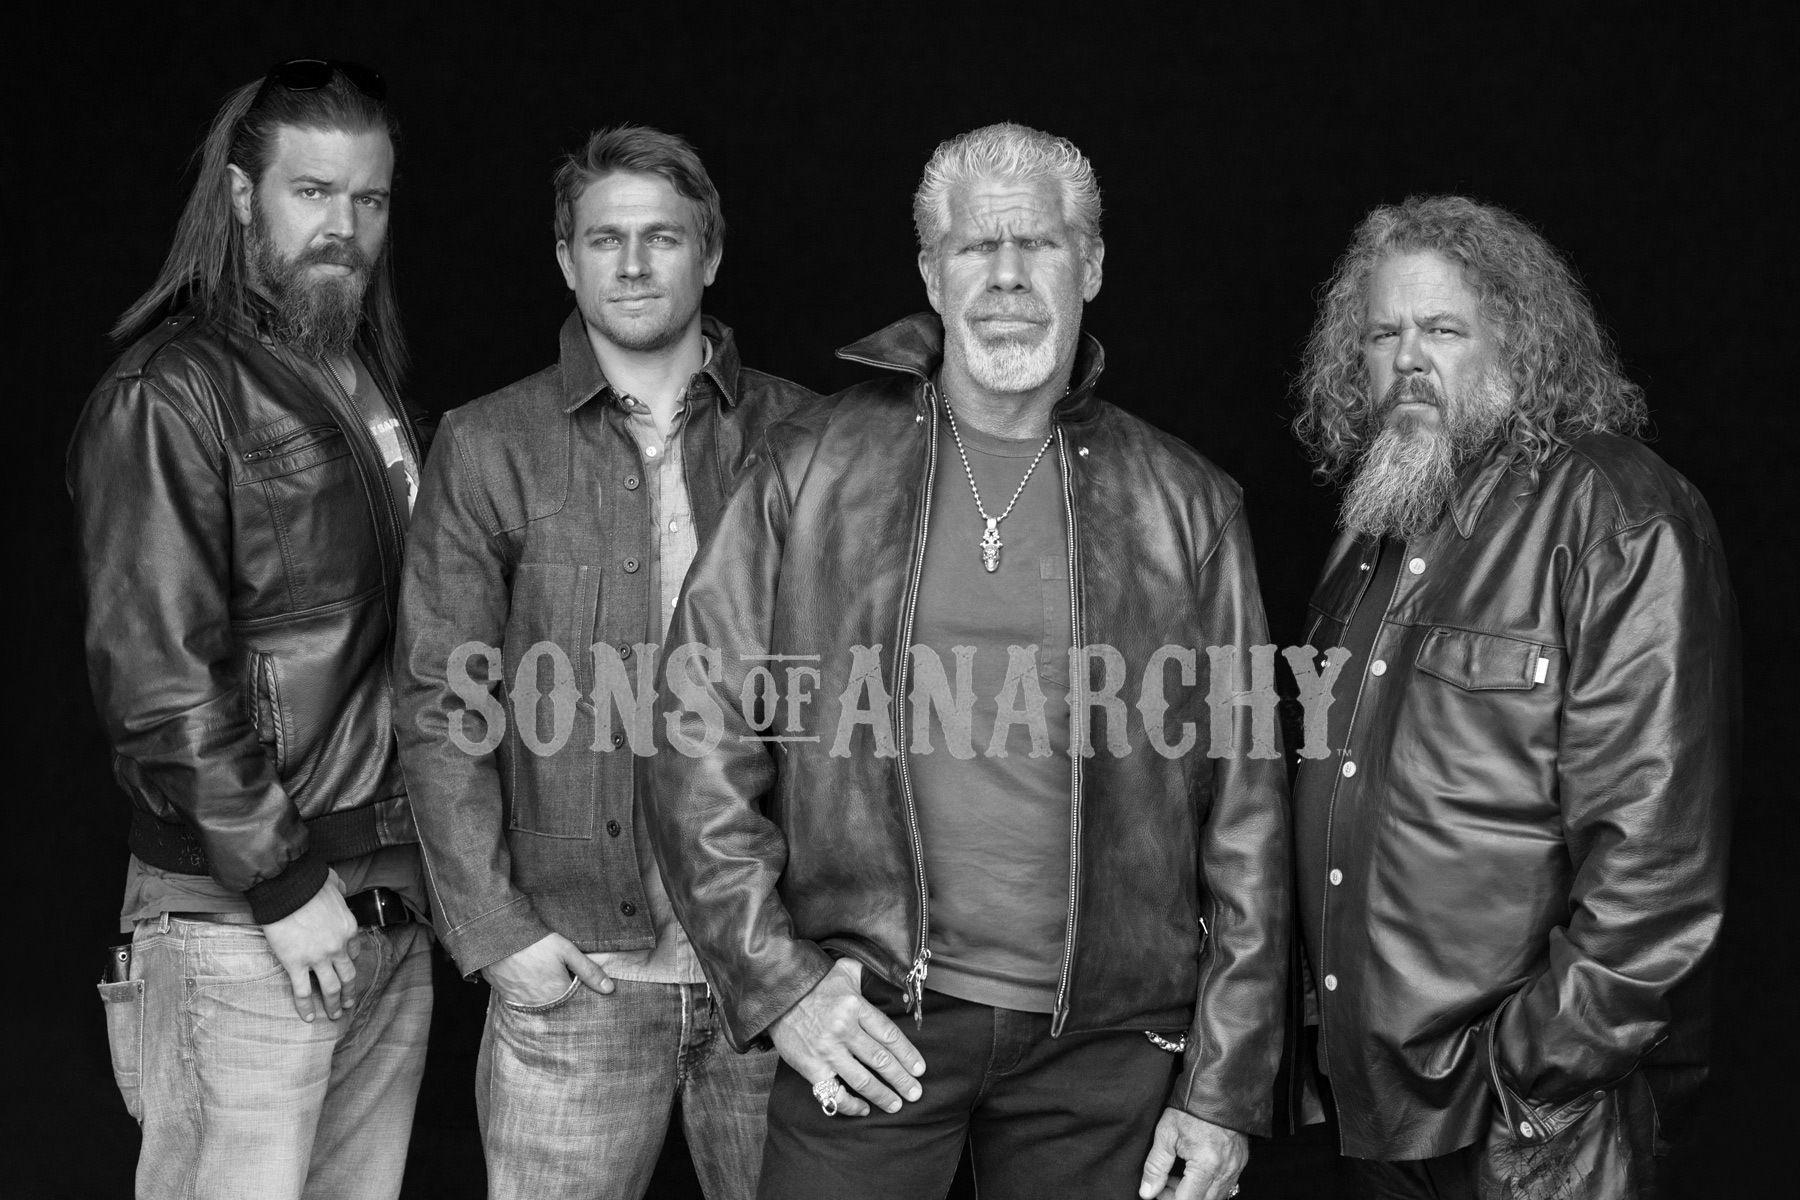 sons of anarchy celebrity cast hot men in beards pinterest anarchy sons and celebrity. Black Bedroom Furniture Sets. Home Design Ideas